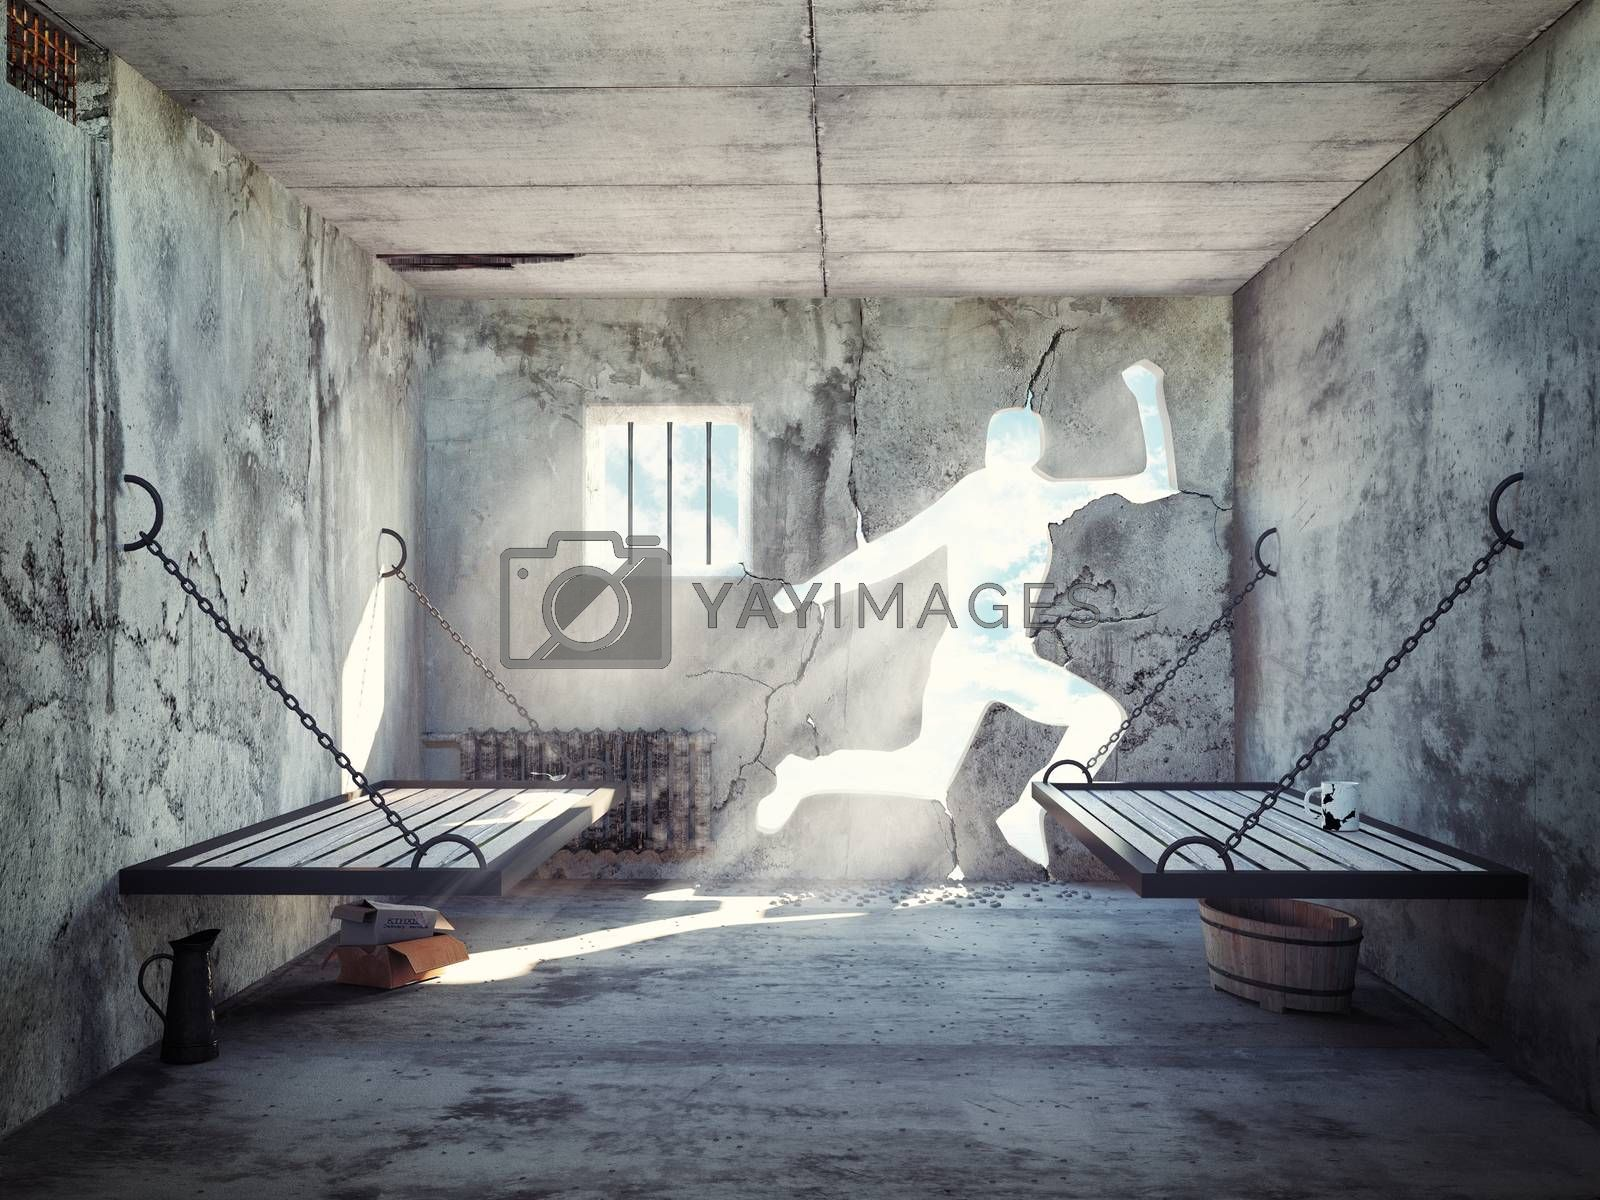 escape from a prison cell. 3d concept